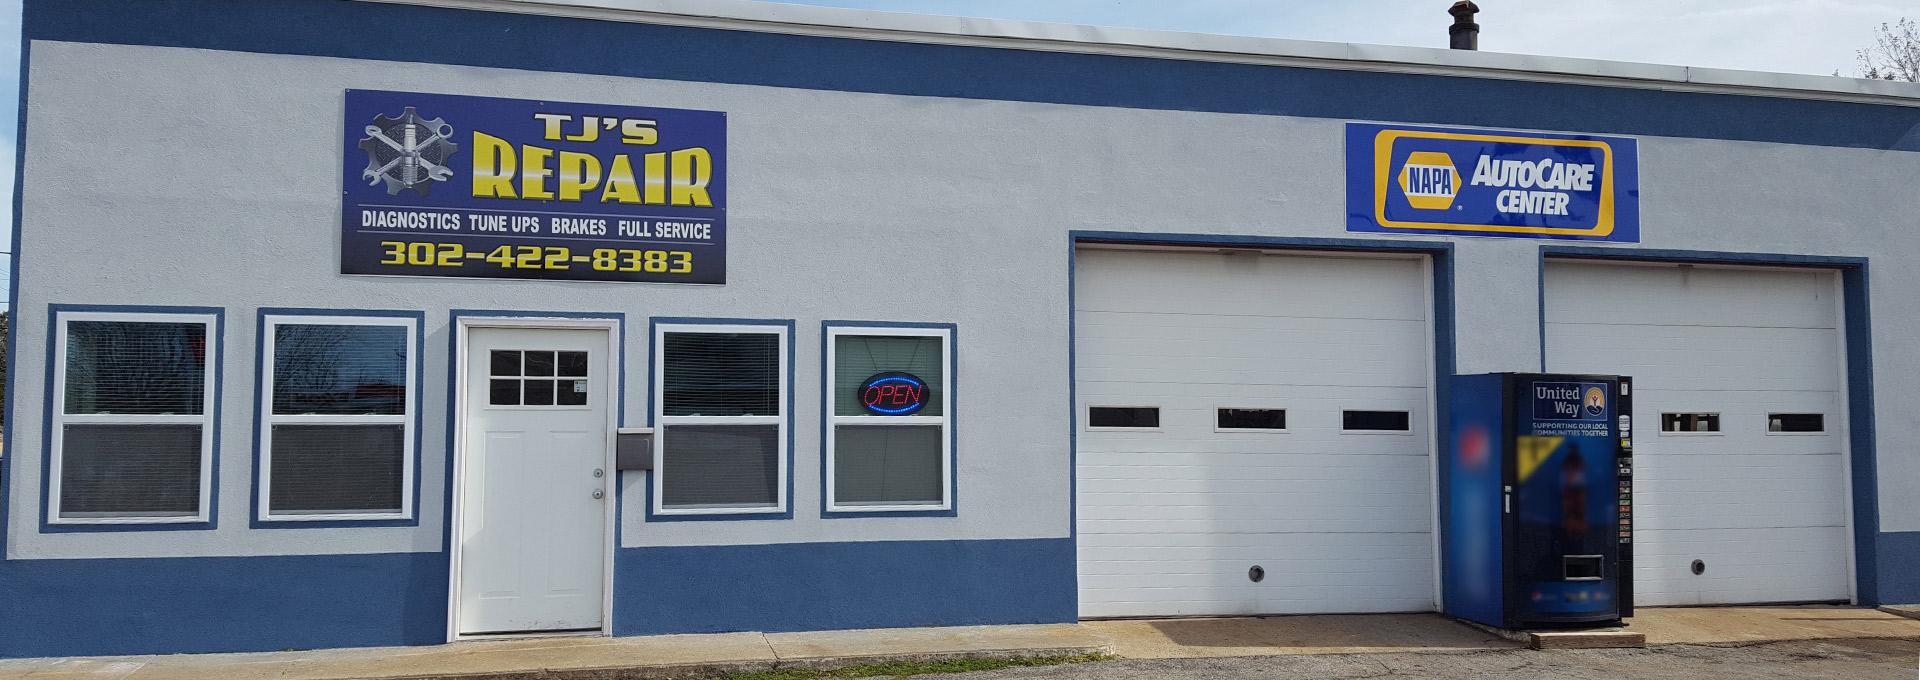 Auto Service & Auto Repair in Milford | TJ's Repair